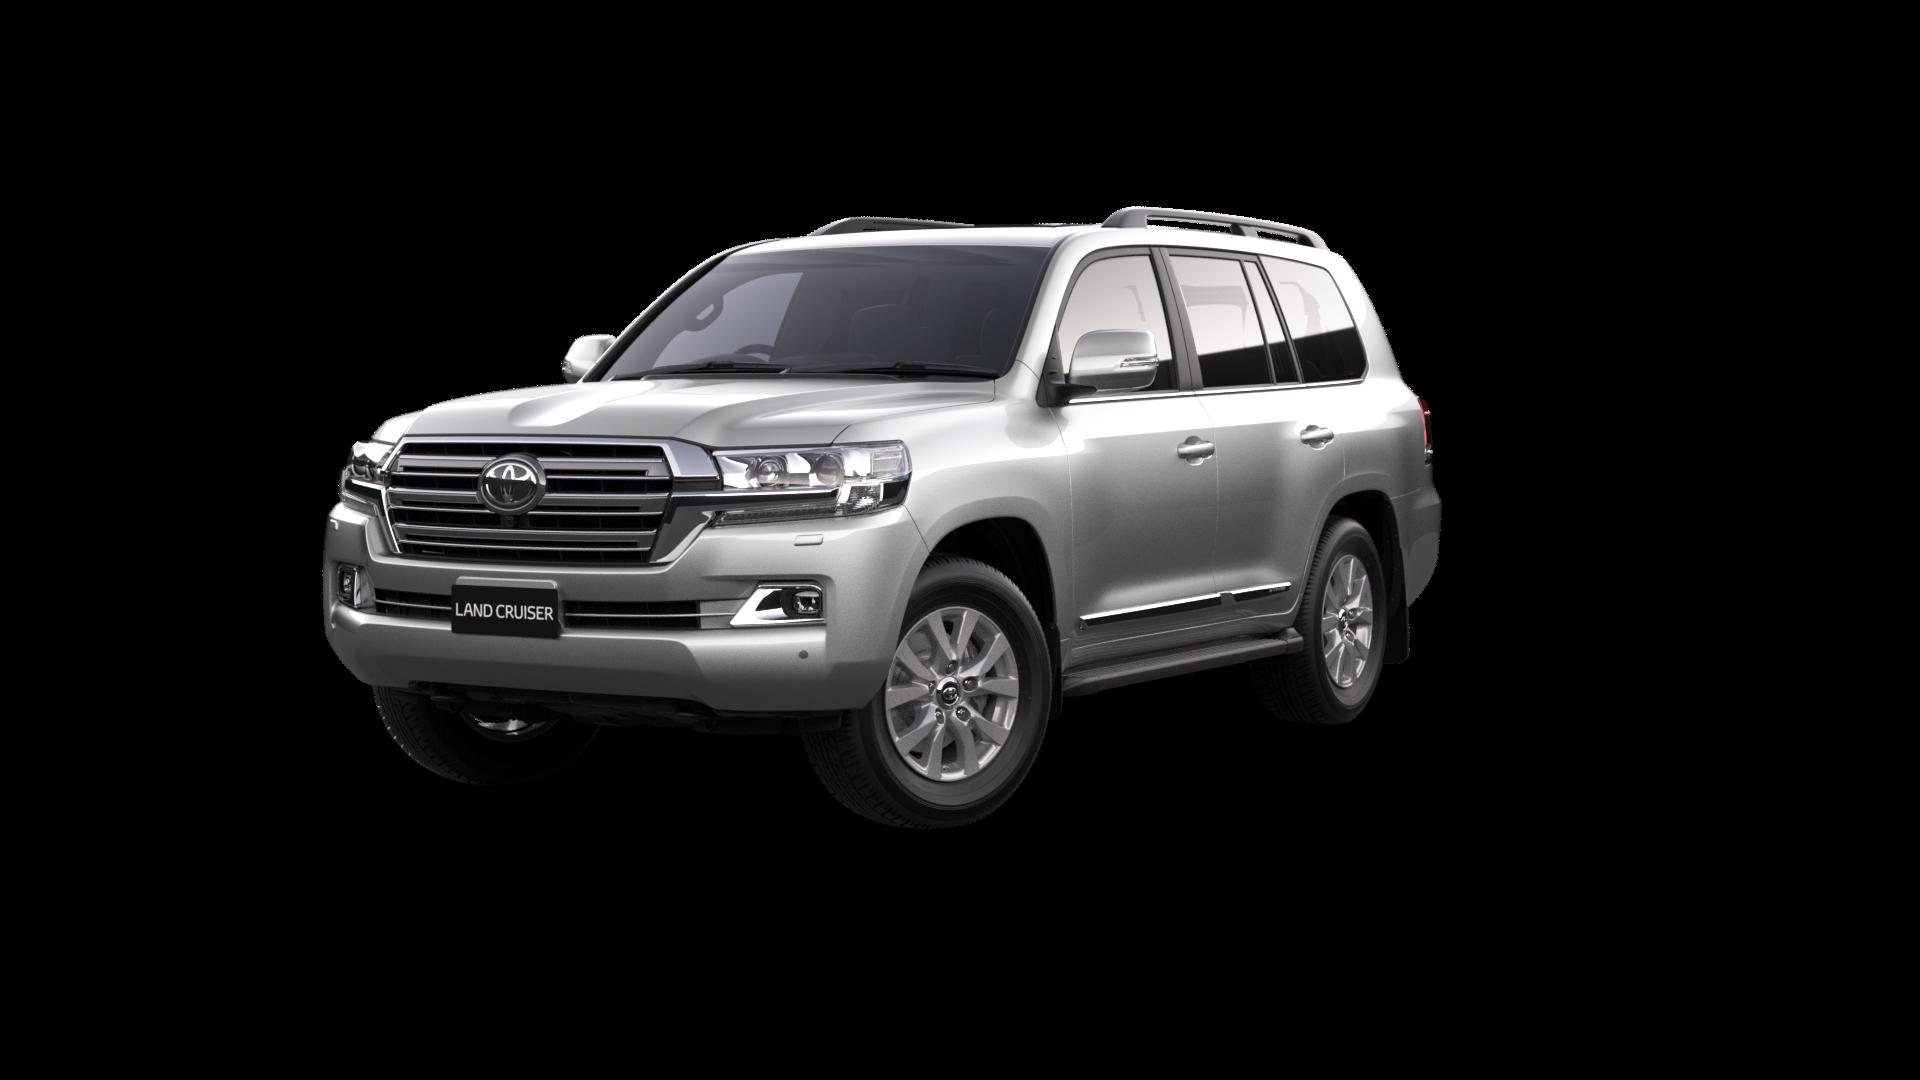 Toyota LandCruiser 200 Sahara in Crystal Pearl